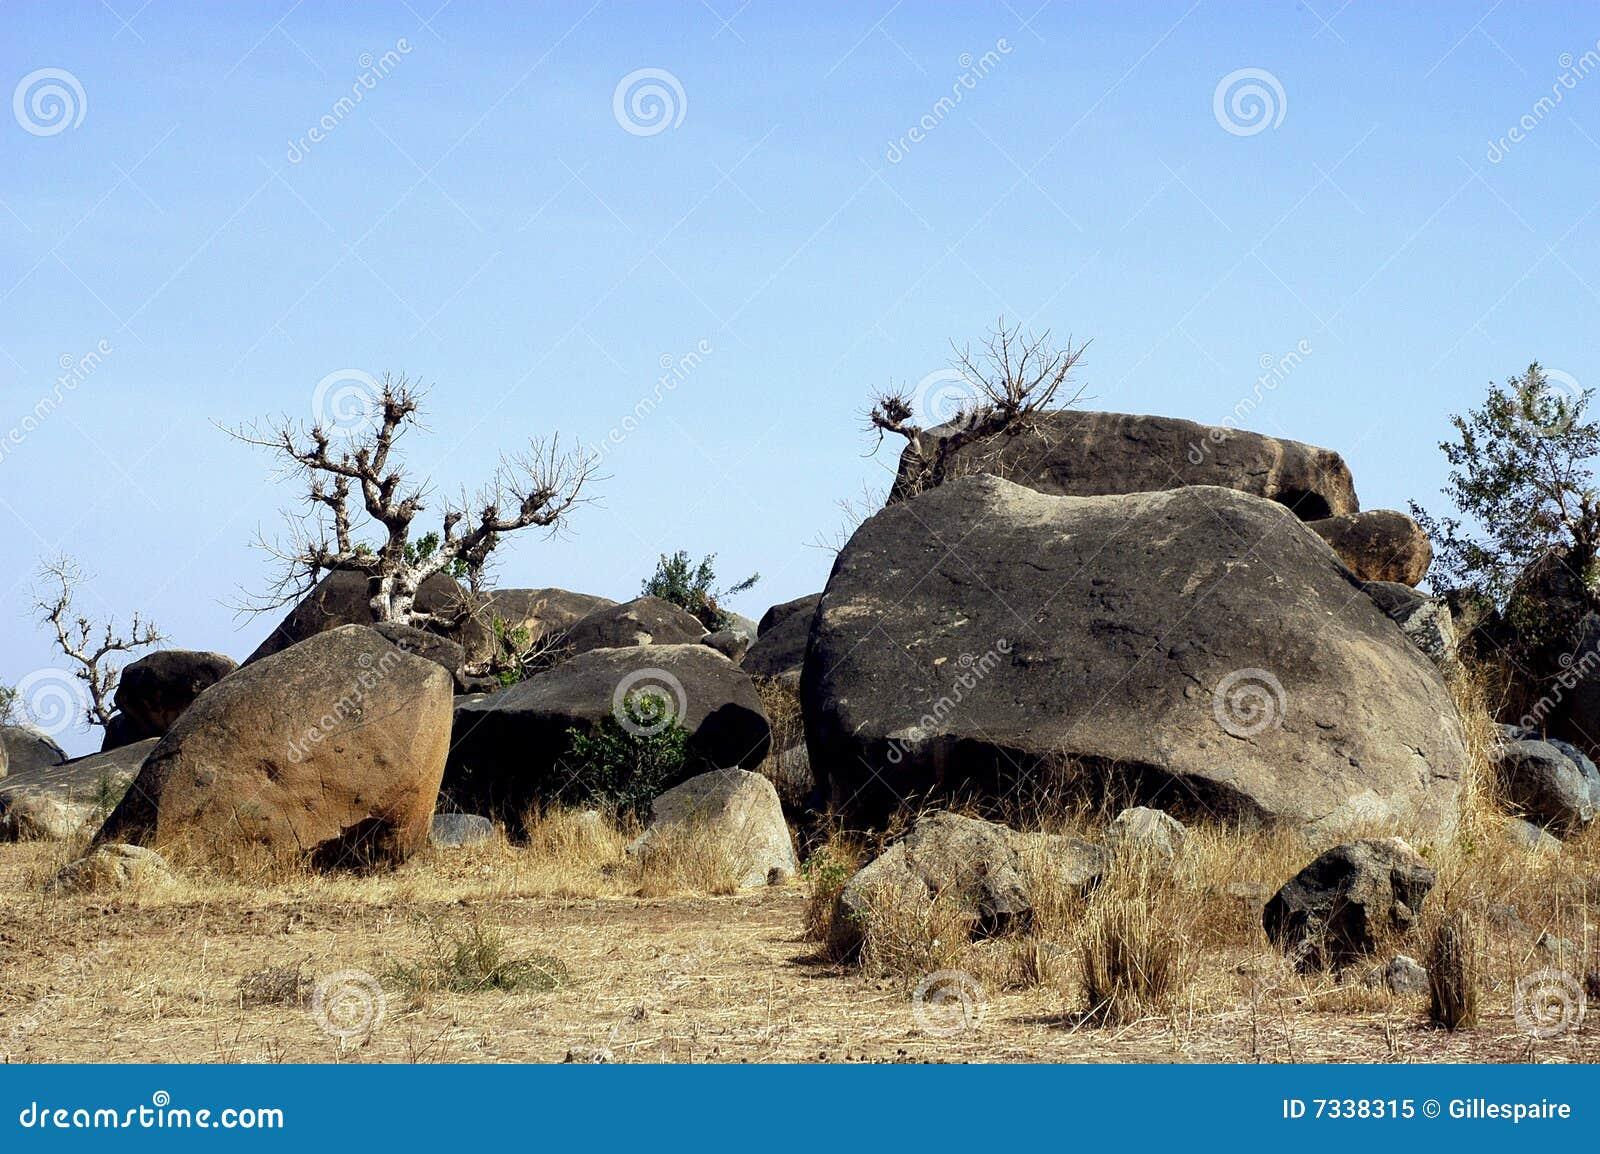 Boulders in savanna landscape royalty free stock photo for Landscaping rocks savannah ga